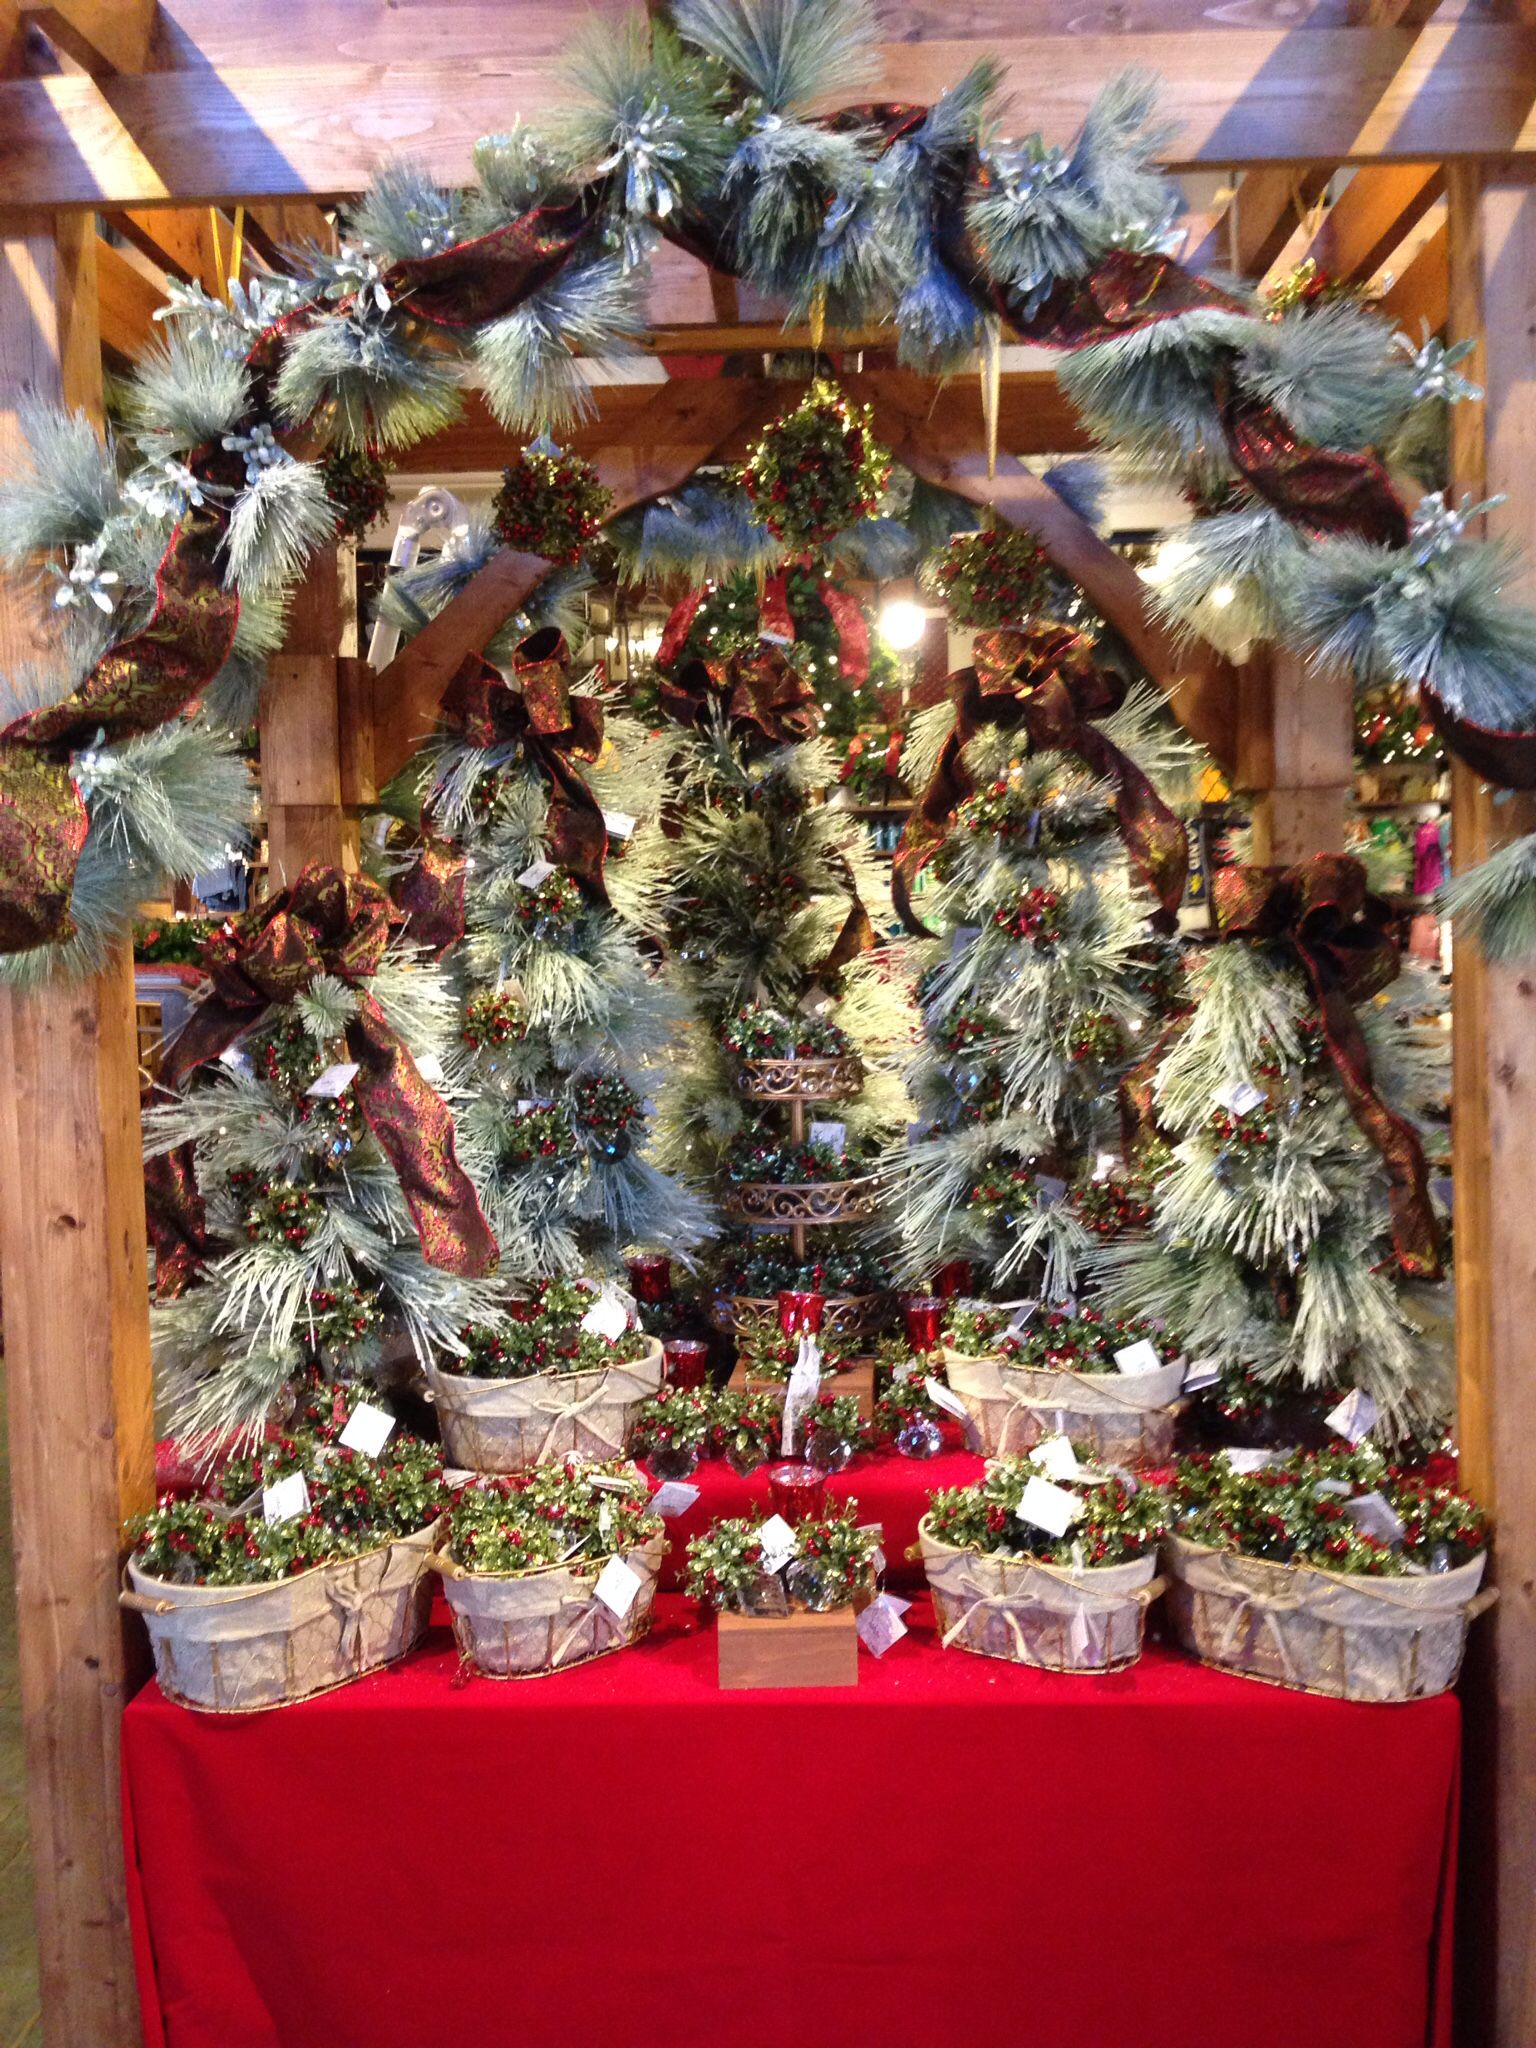 Kissing Krystal display, Christmas Town Busch Gardens Williamsburg ...